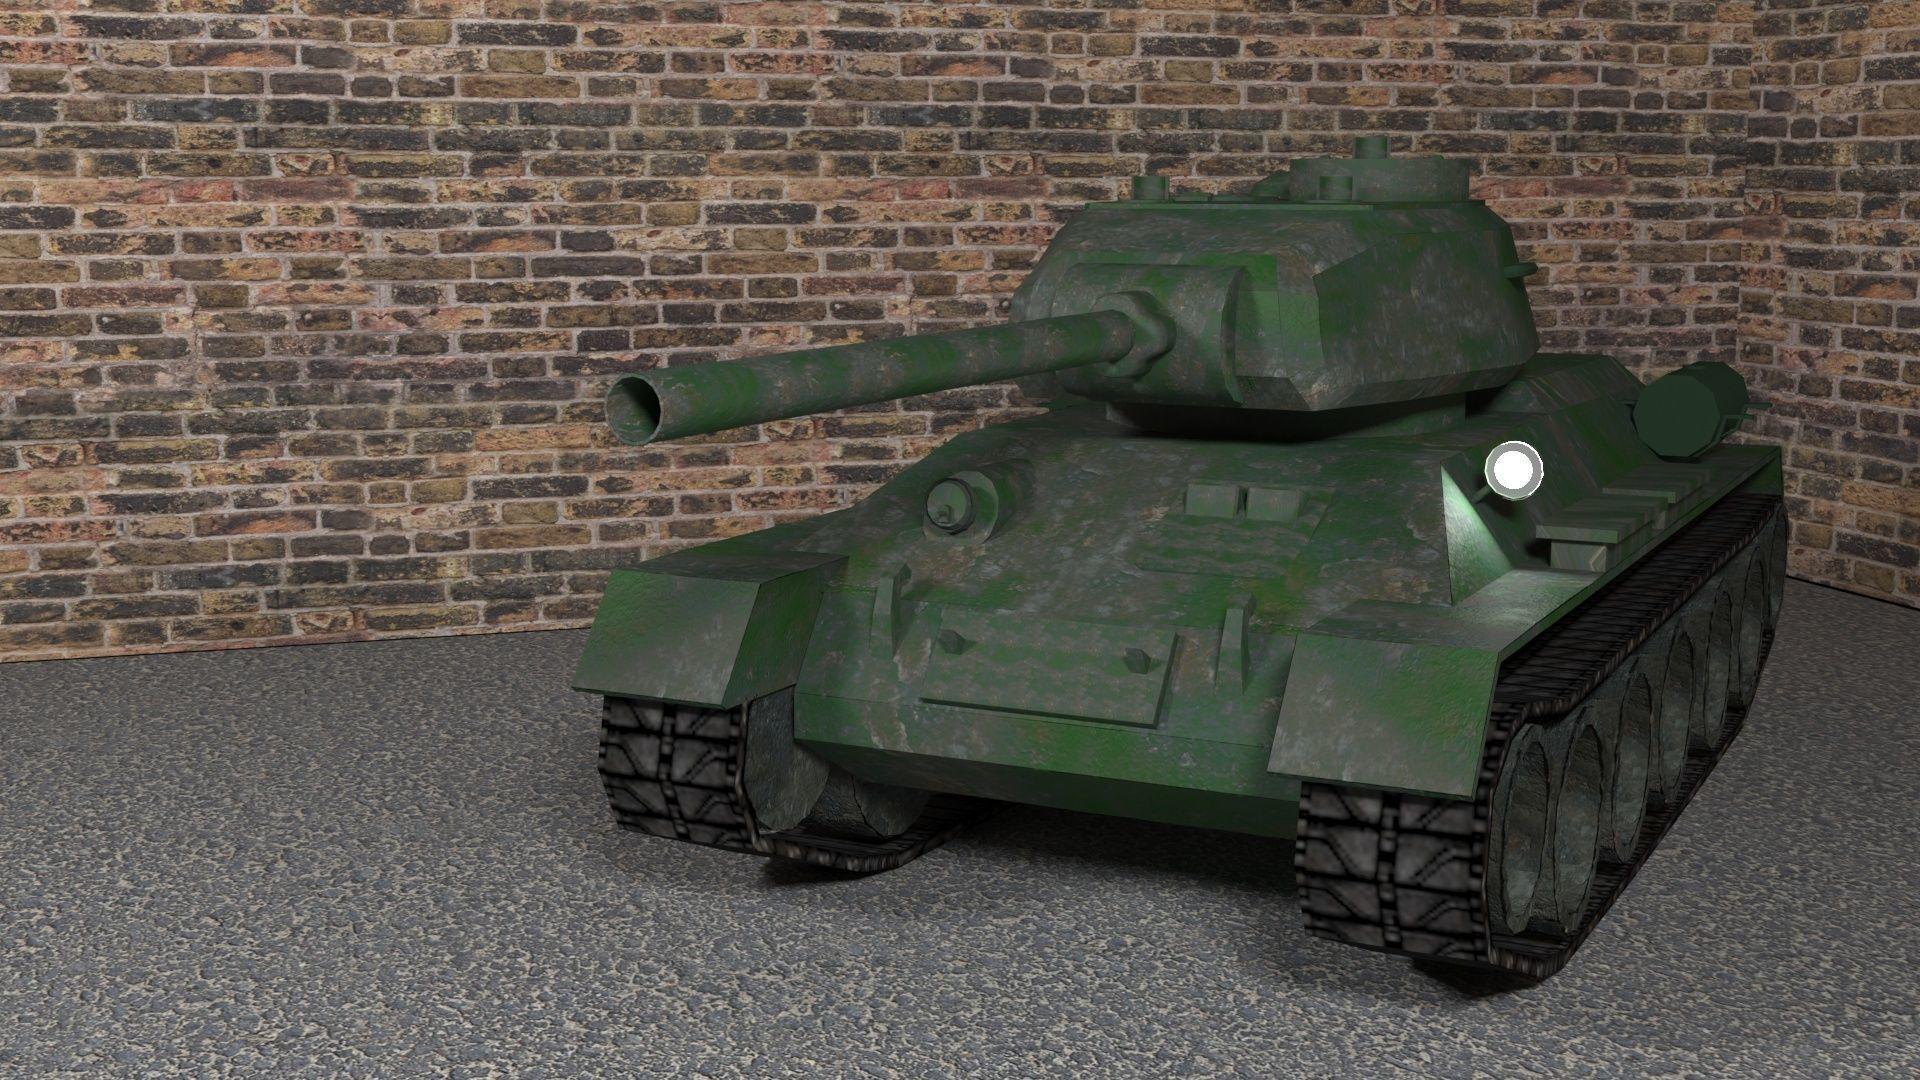 Tank T-34-85 low-poly 3D model